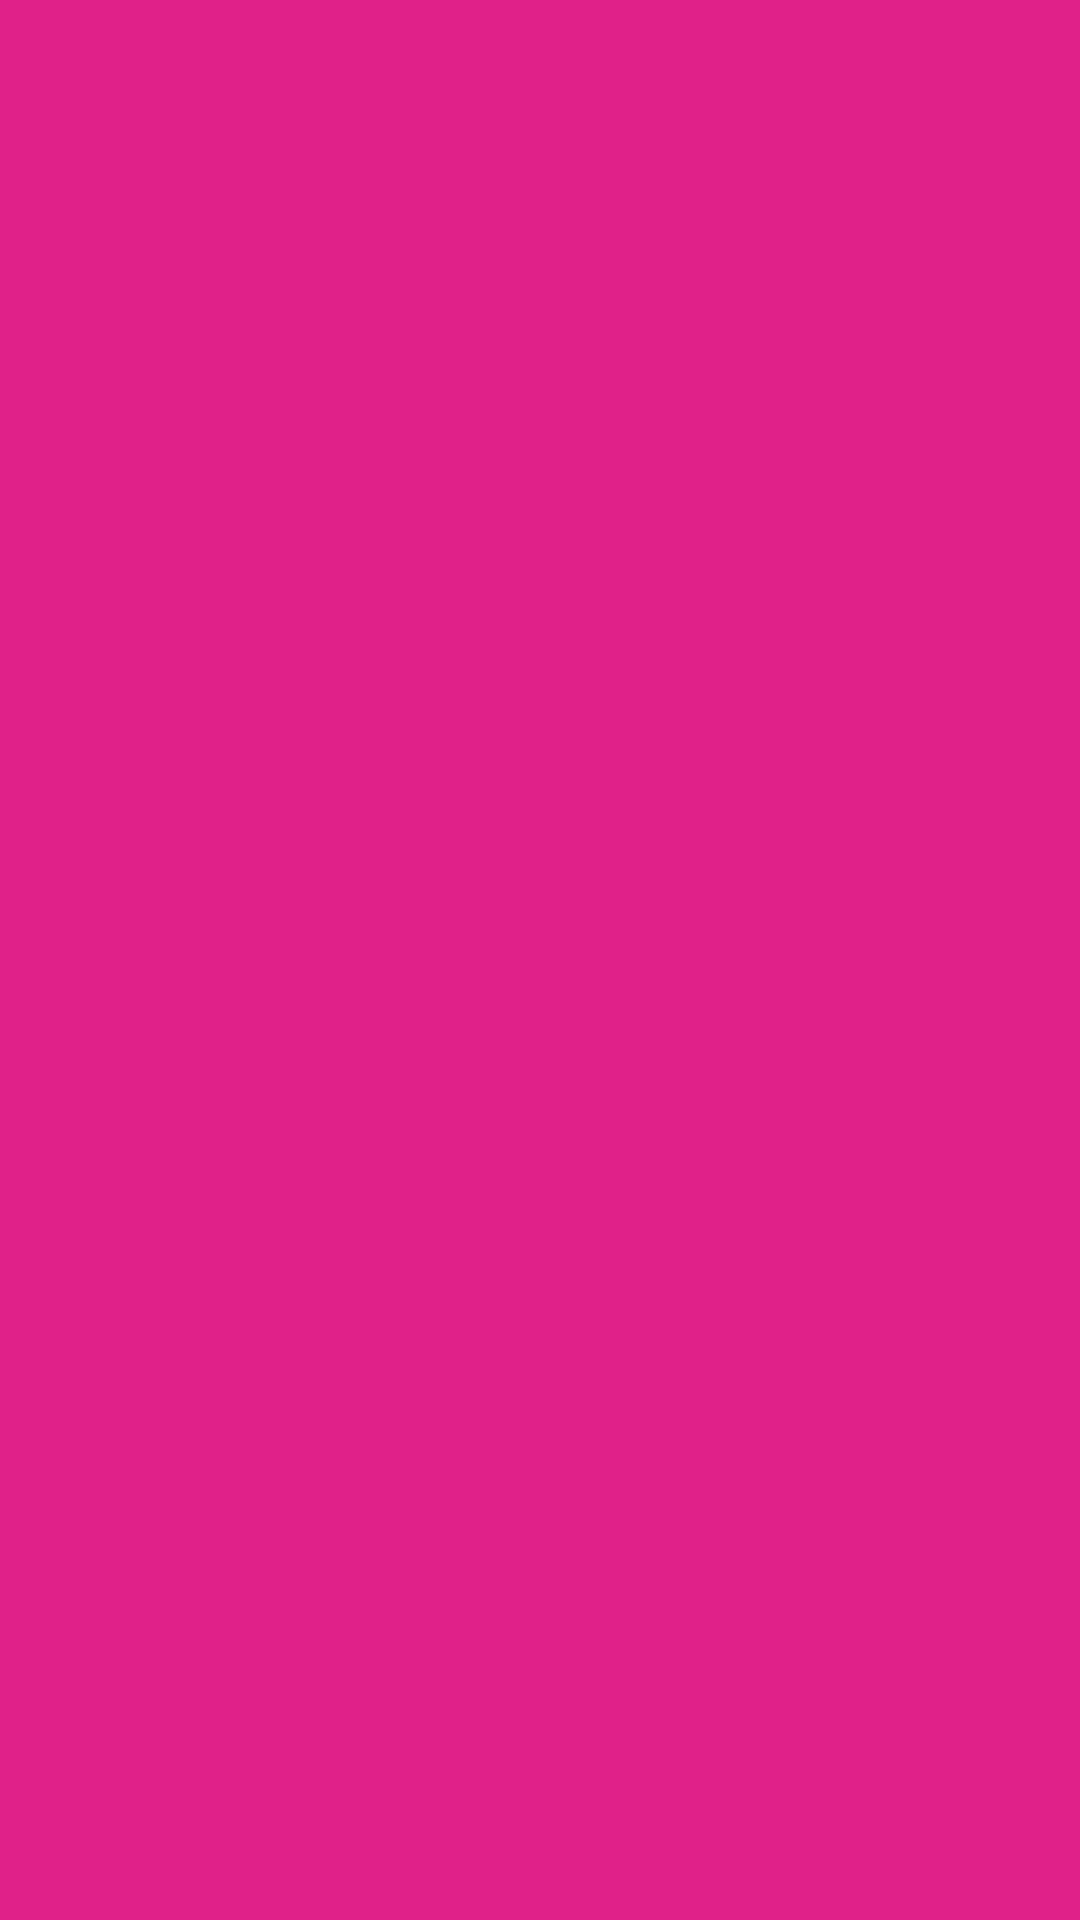 1080x1920 Barbie Pink Solid Color Background